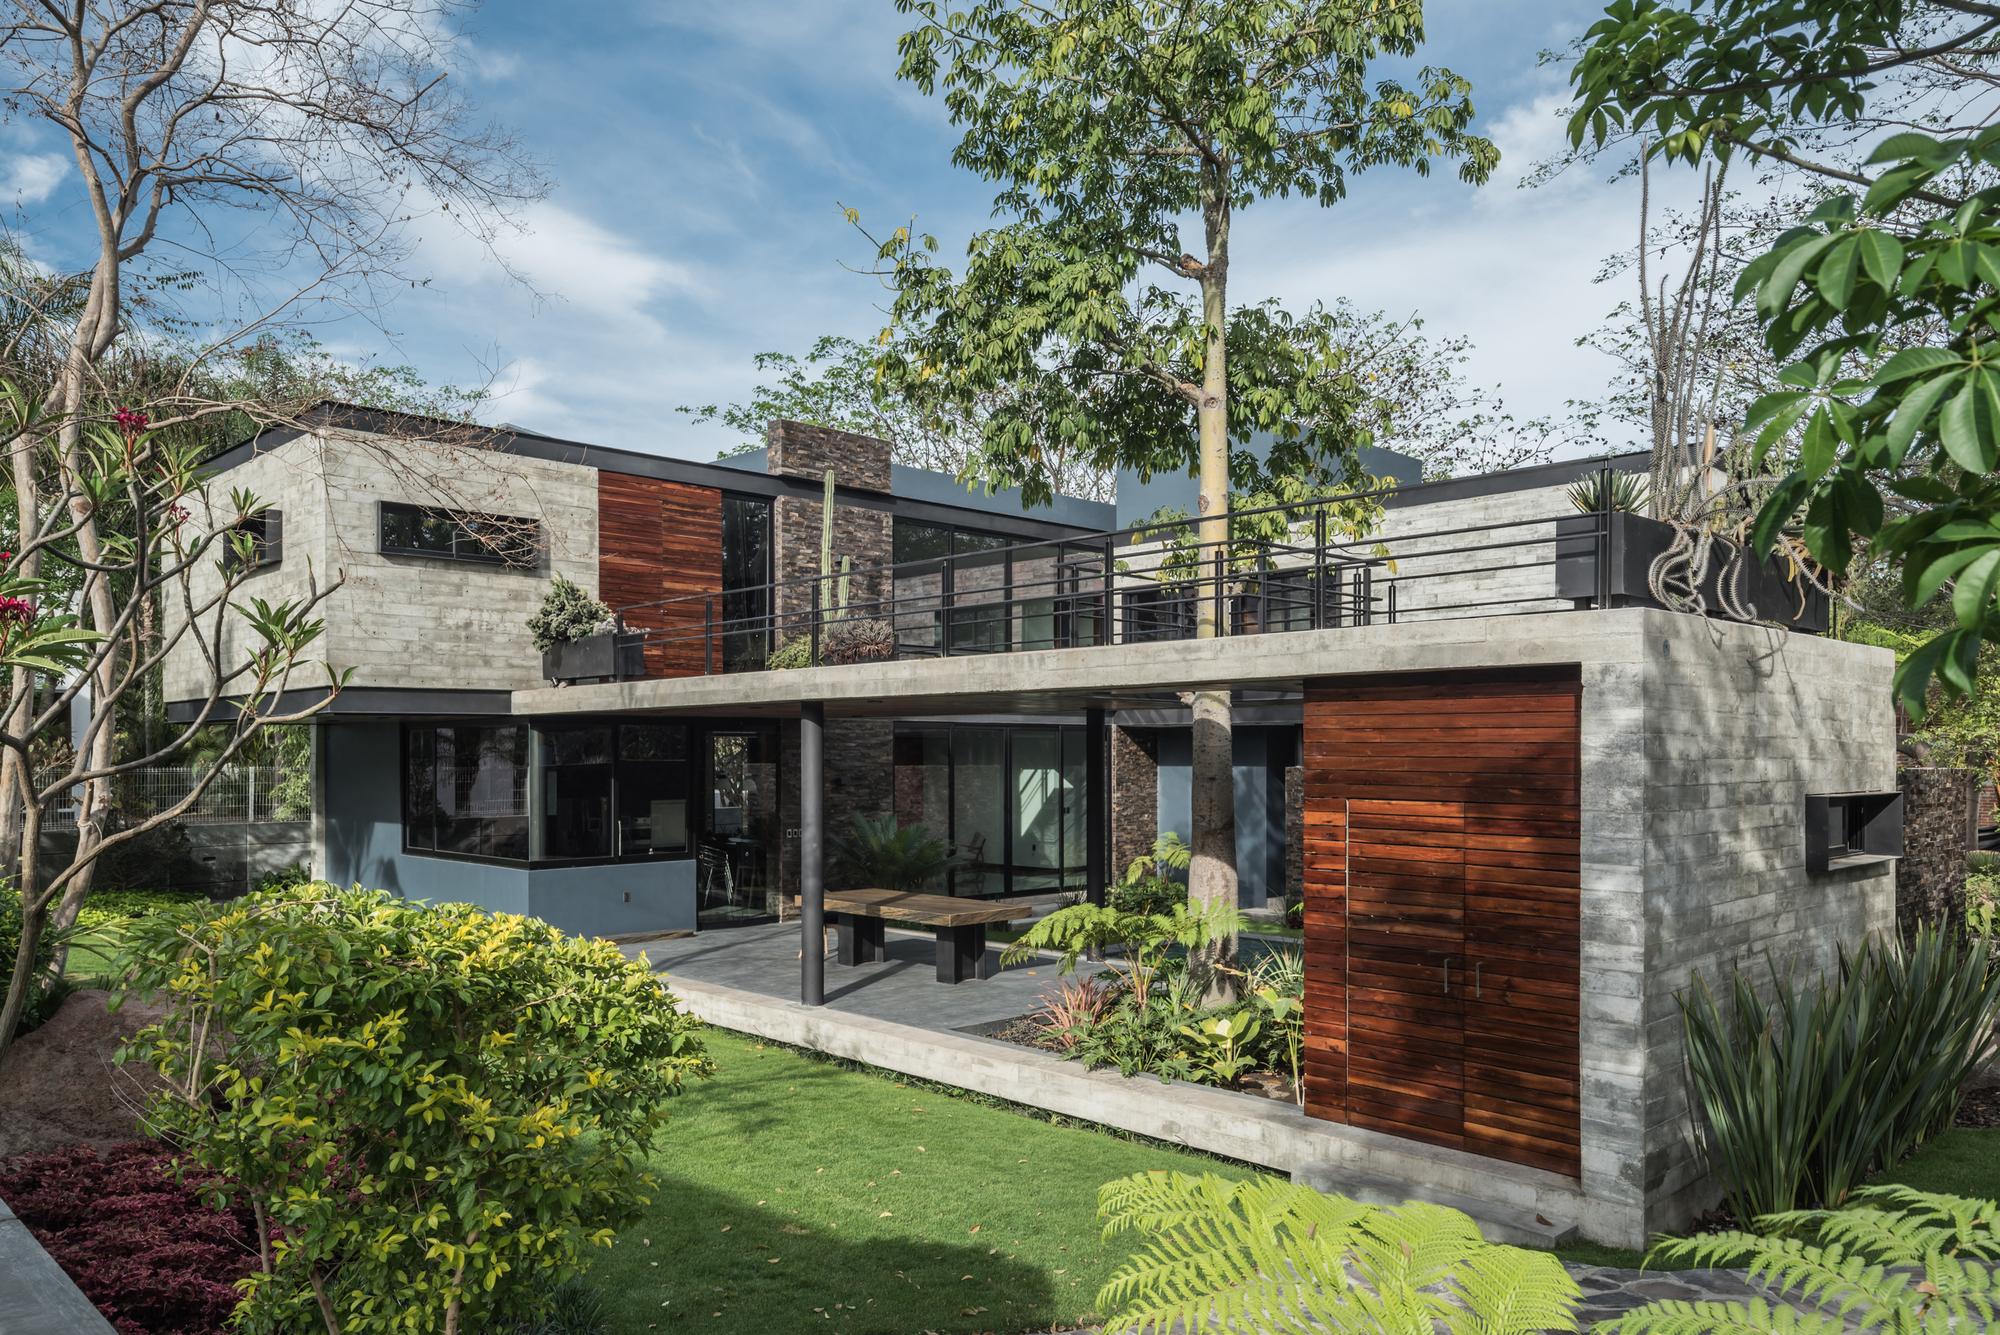 Galer a de casa kalyvas di frenna arquitectos 19 for Casa di tronchi moderna